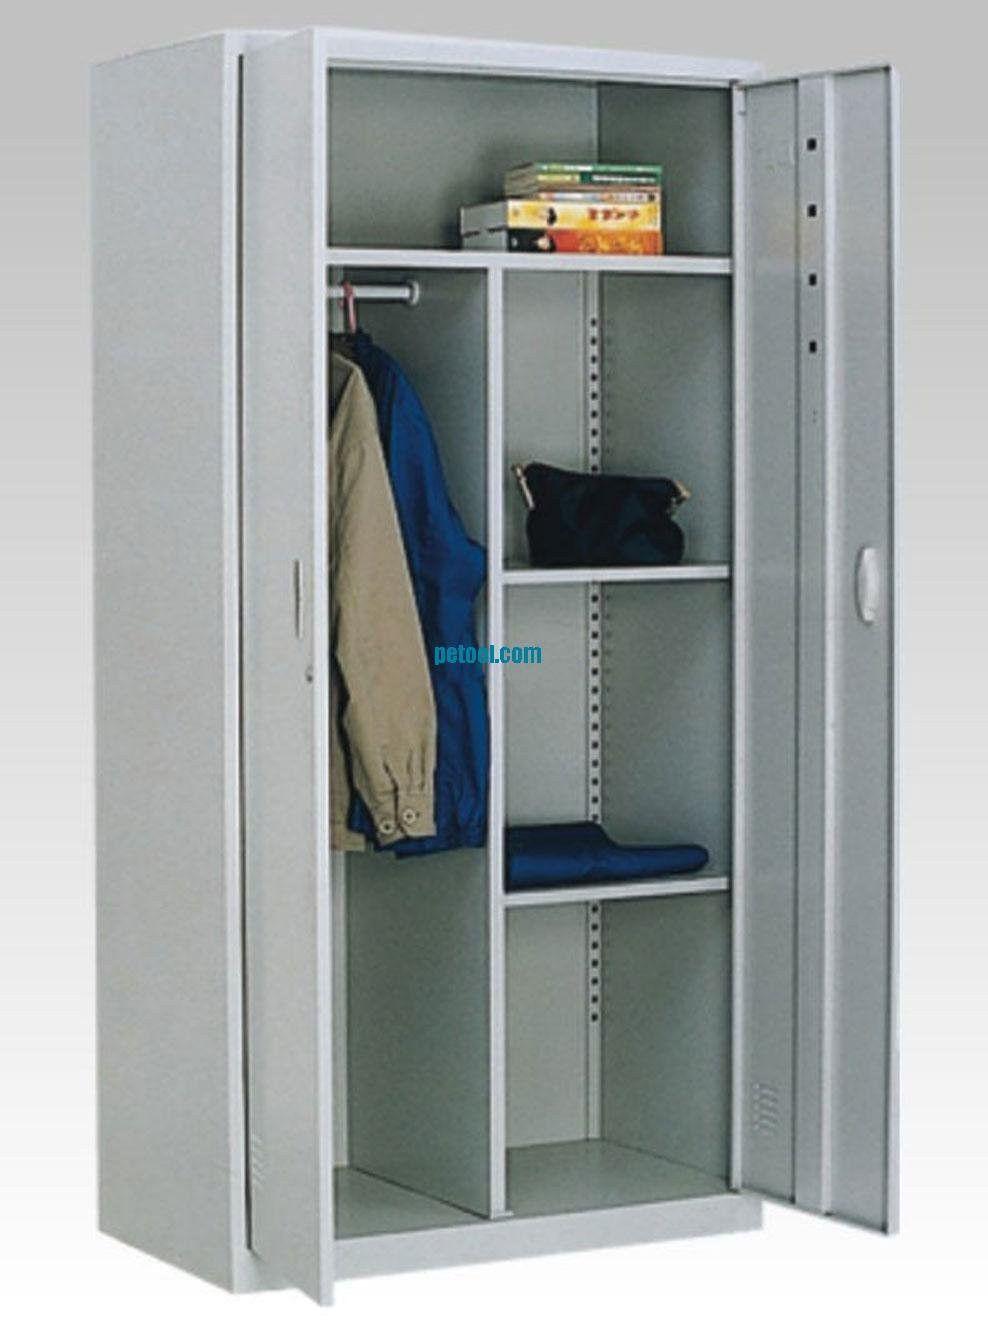 50+ Metal Wardrobe Storage Cabinet - Kitchen Decorating Ideas themes Check more at  & 50+ Metal Wardrobe Storage Cabinet - Kitchen Decorating Ideas themes ...